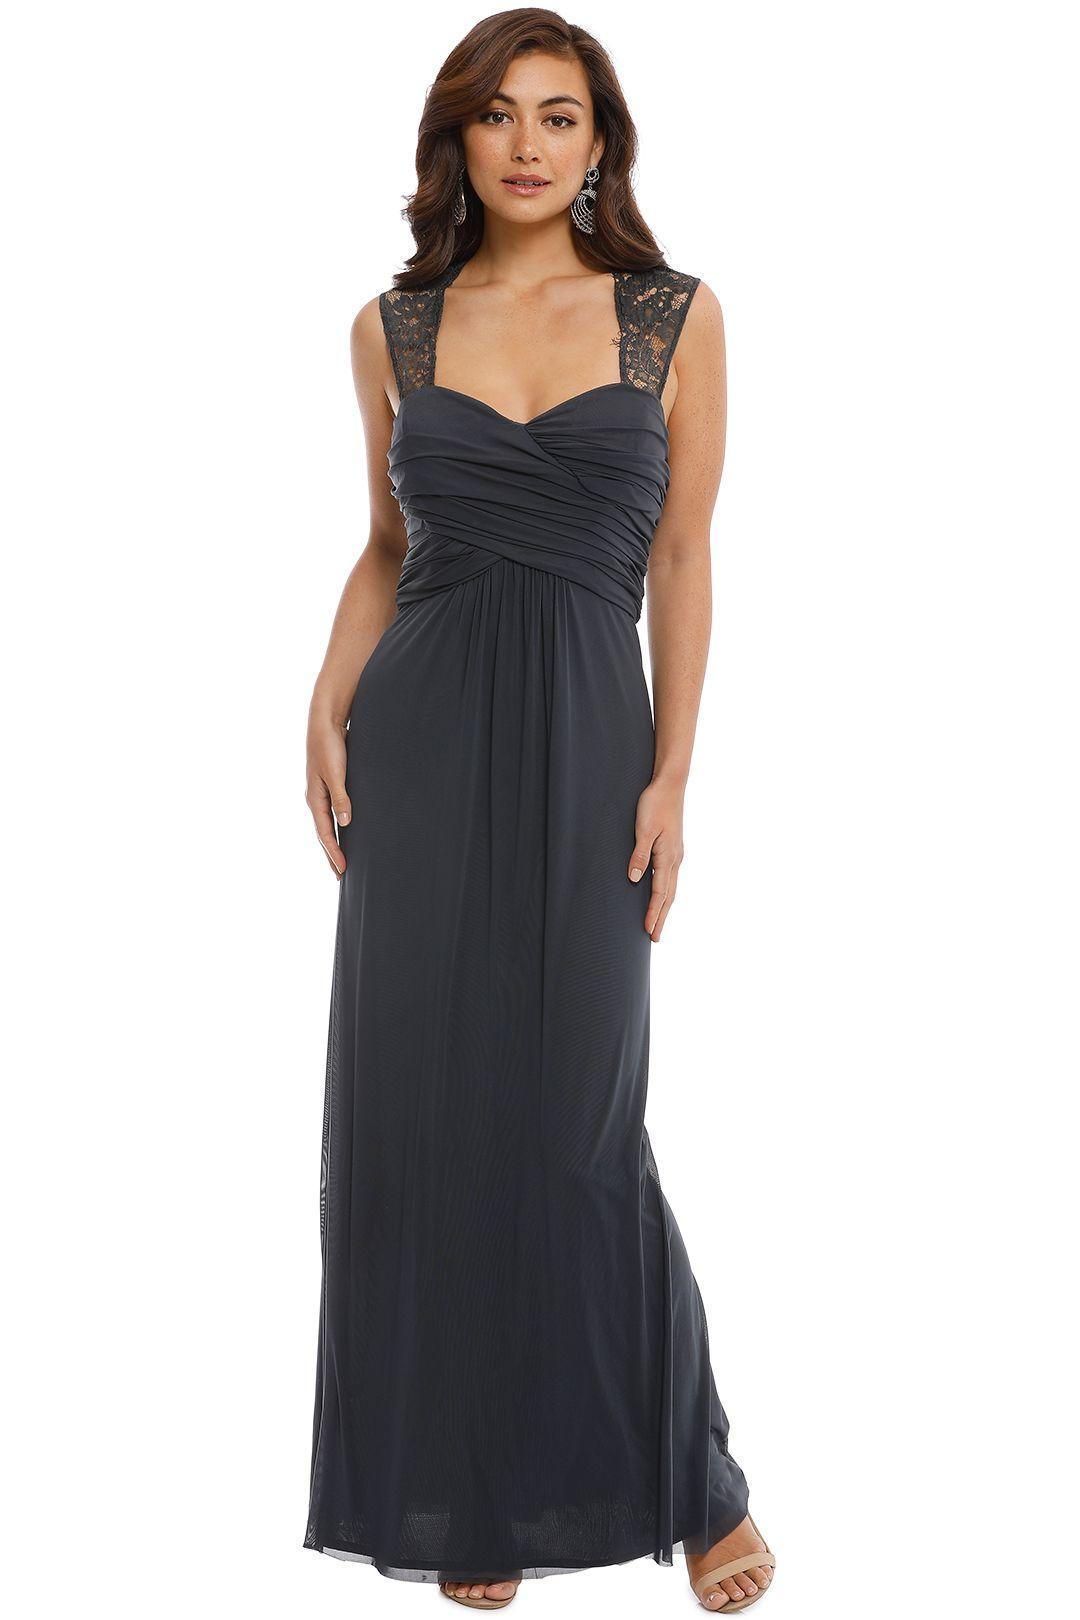 Langhem - Monet Gown - Grey - Front